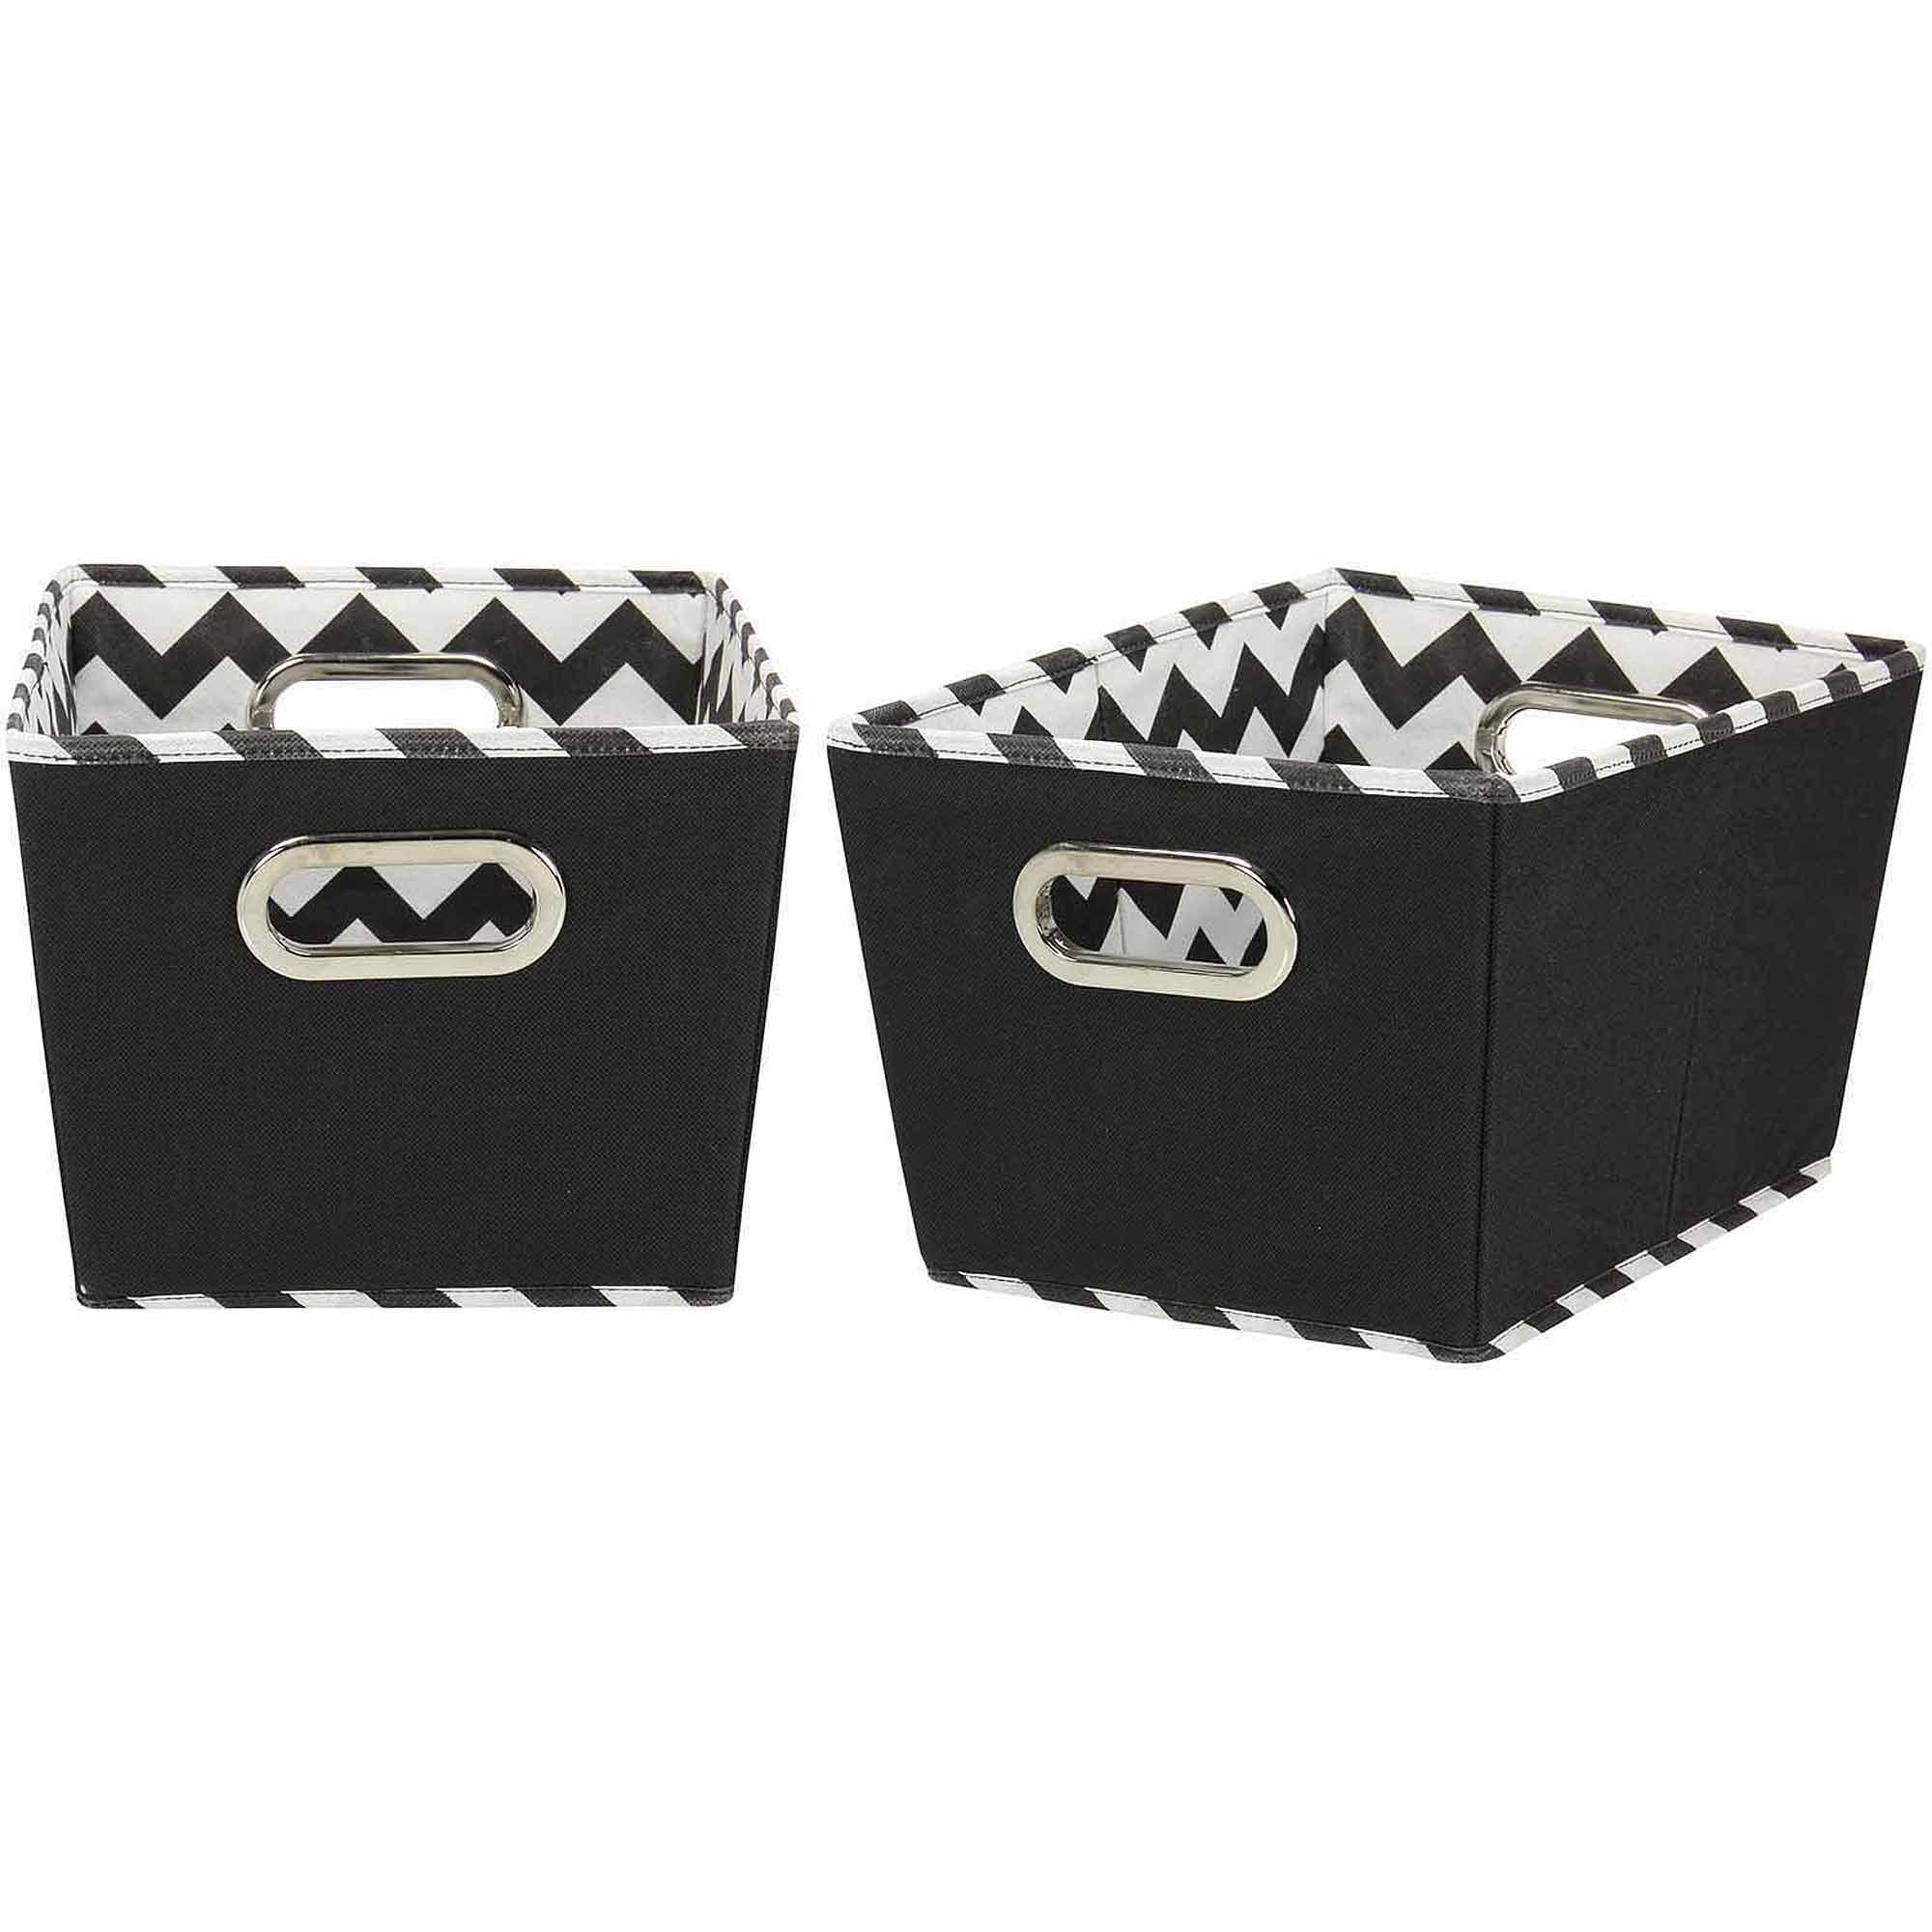 Household Essentials Small Decorative Storage Bins, 2pk, Black and Chevron